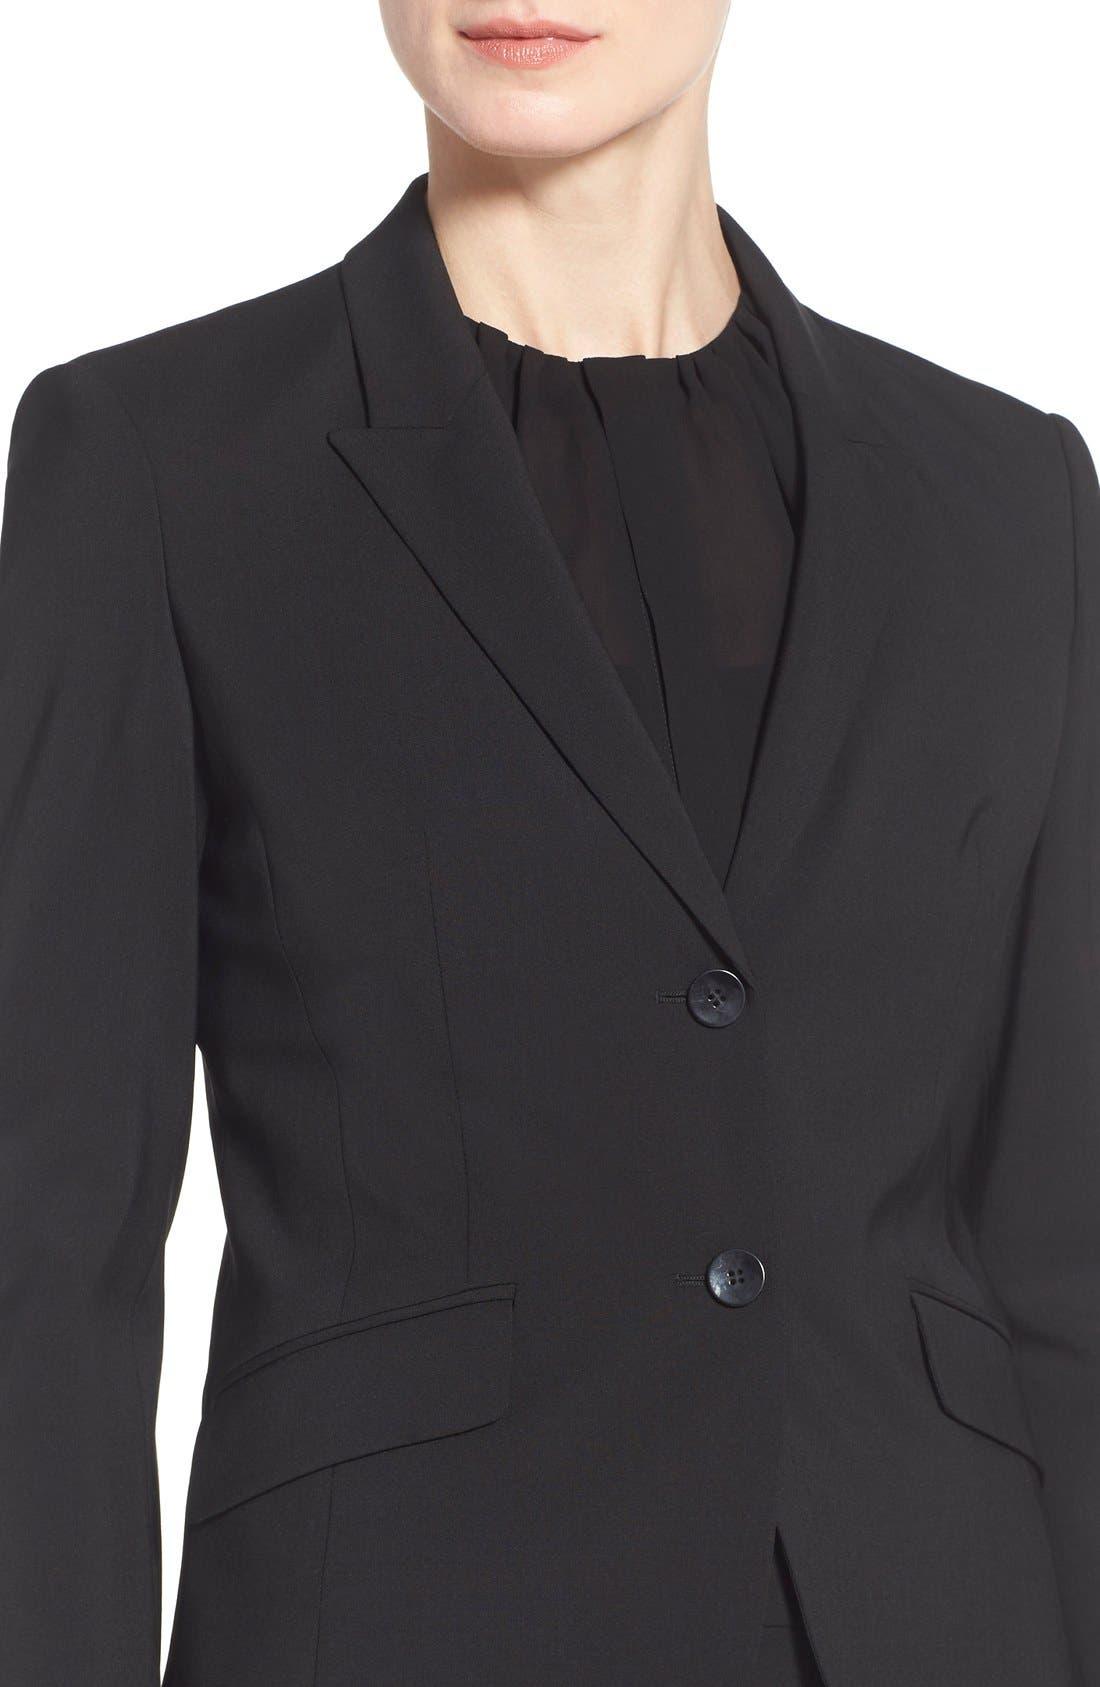 Julea Tropical Stretch Wool Jacket,                             Alternate thumbnail 5, color,                             BLACK